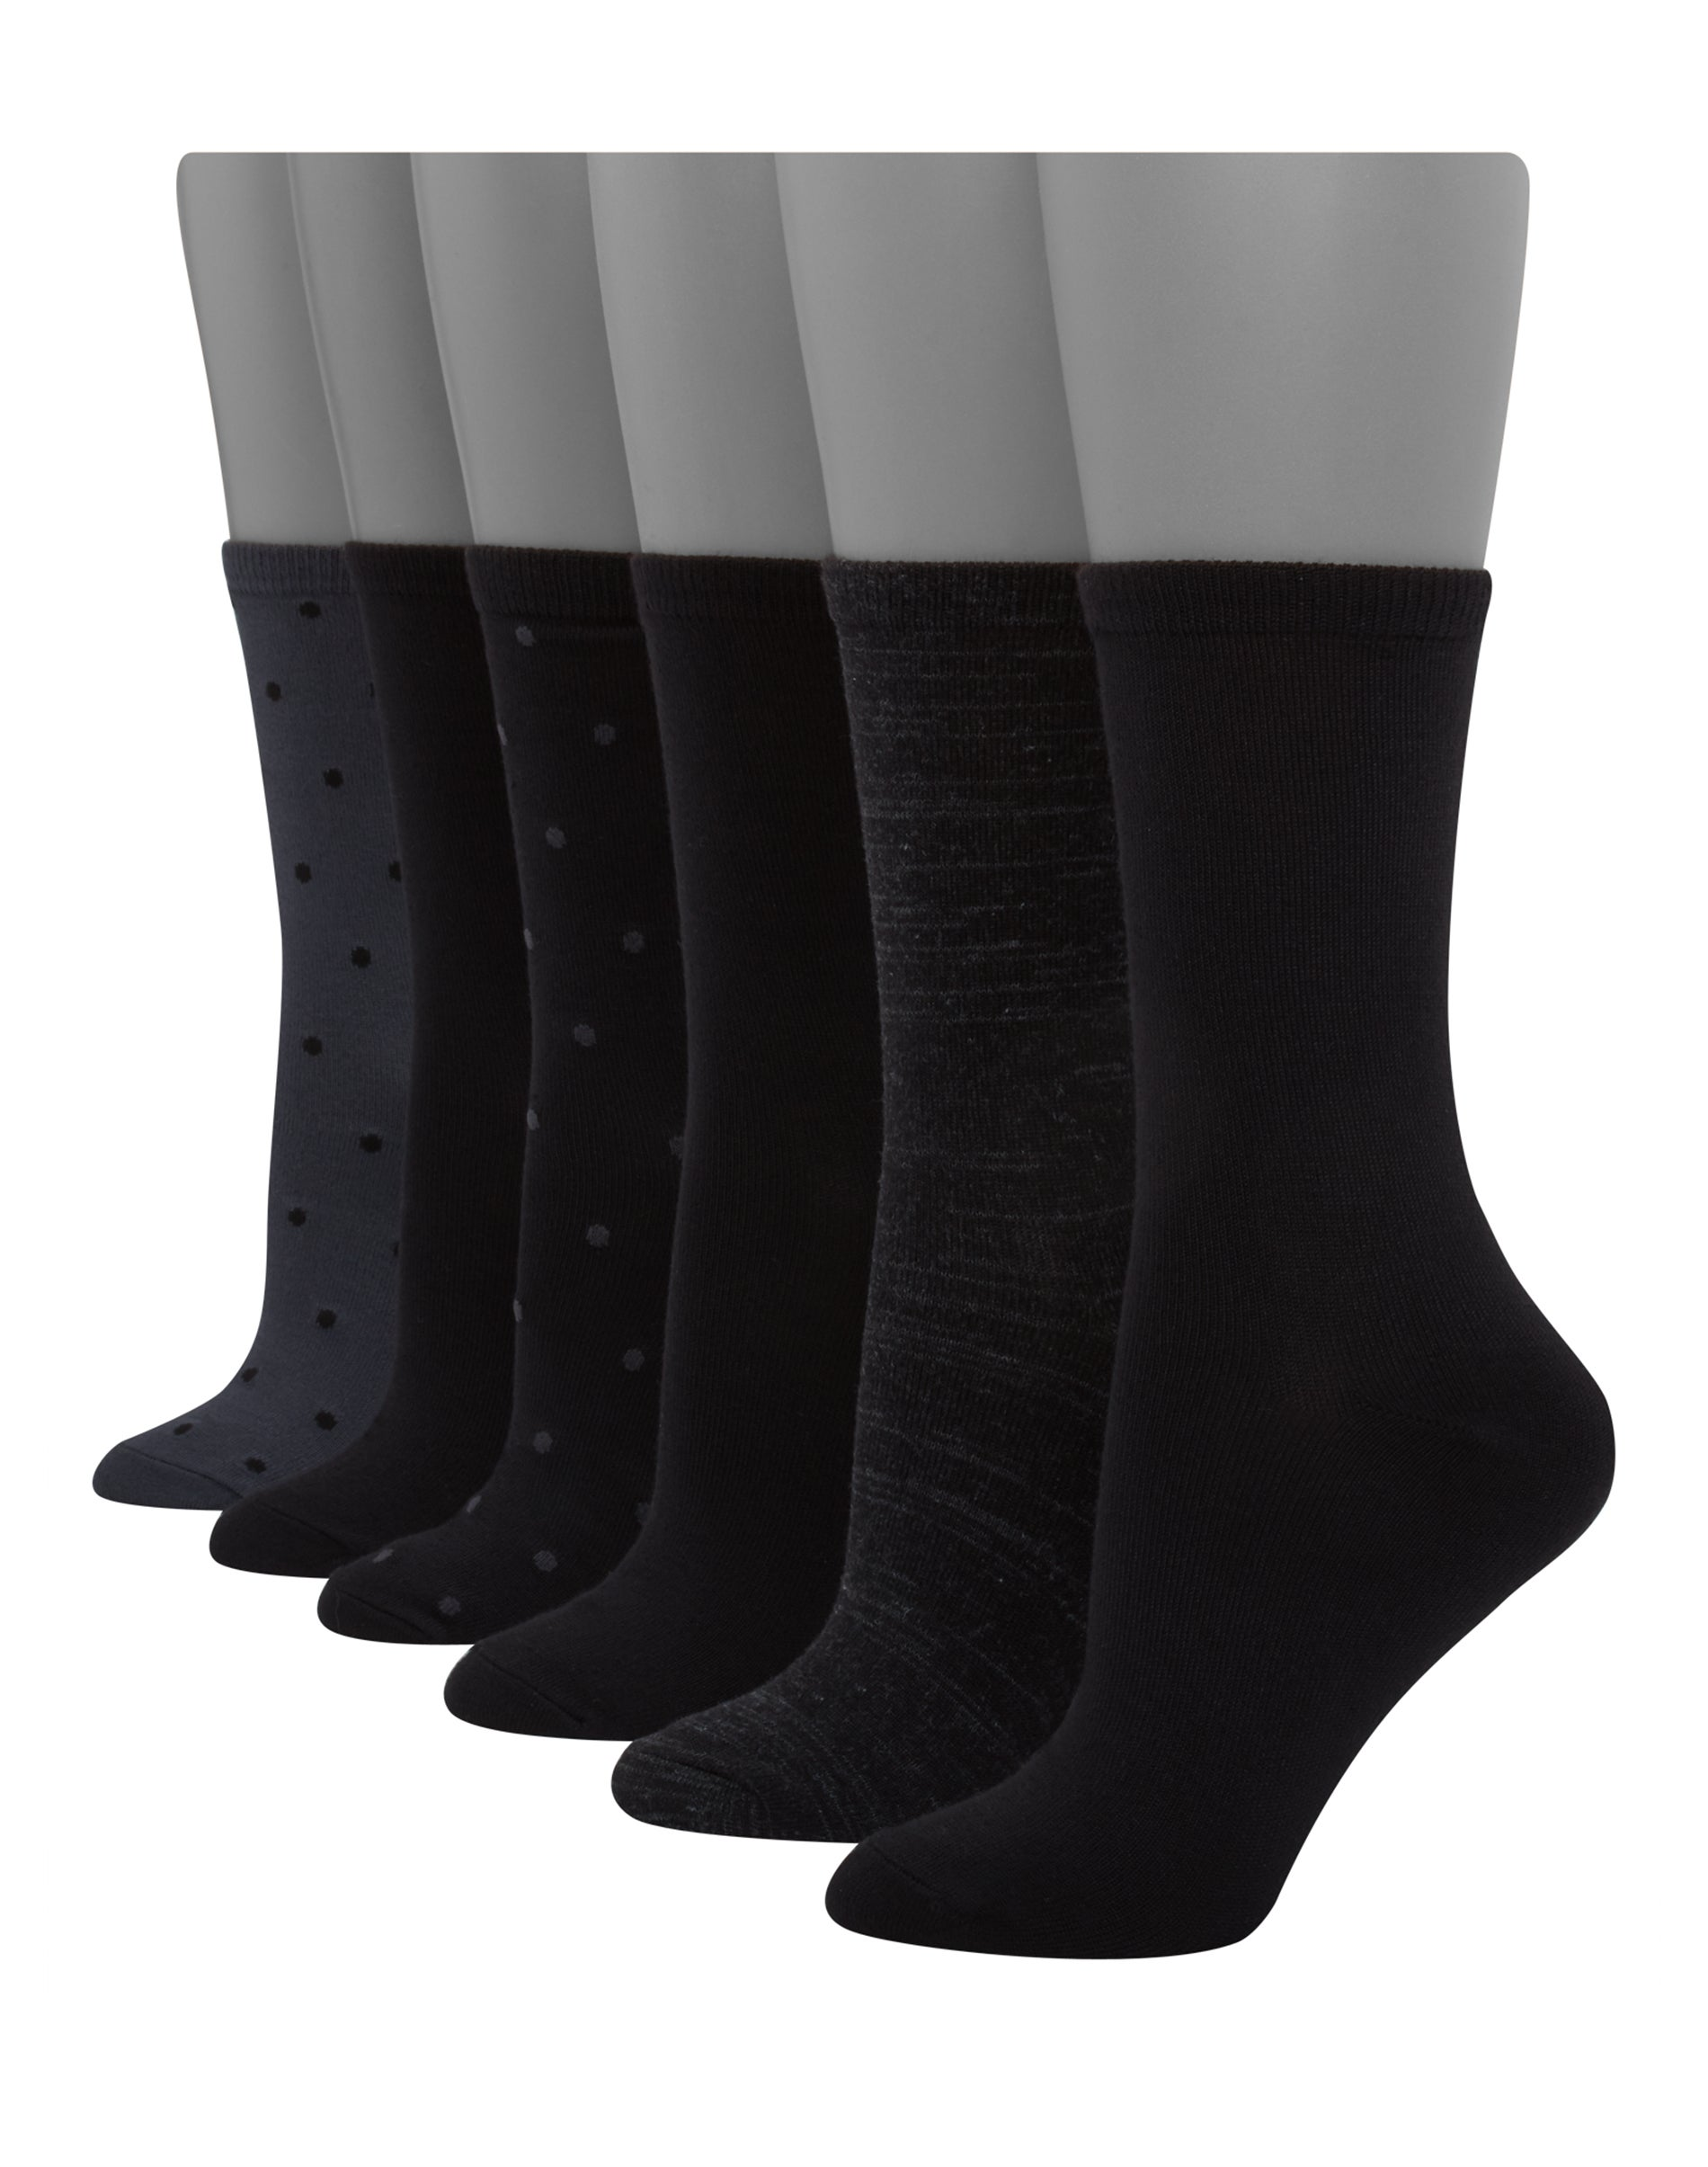 Hanes Women/'s Crew Socks